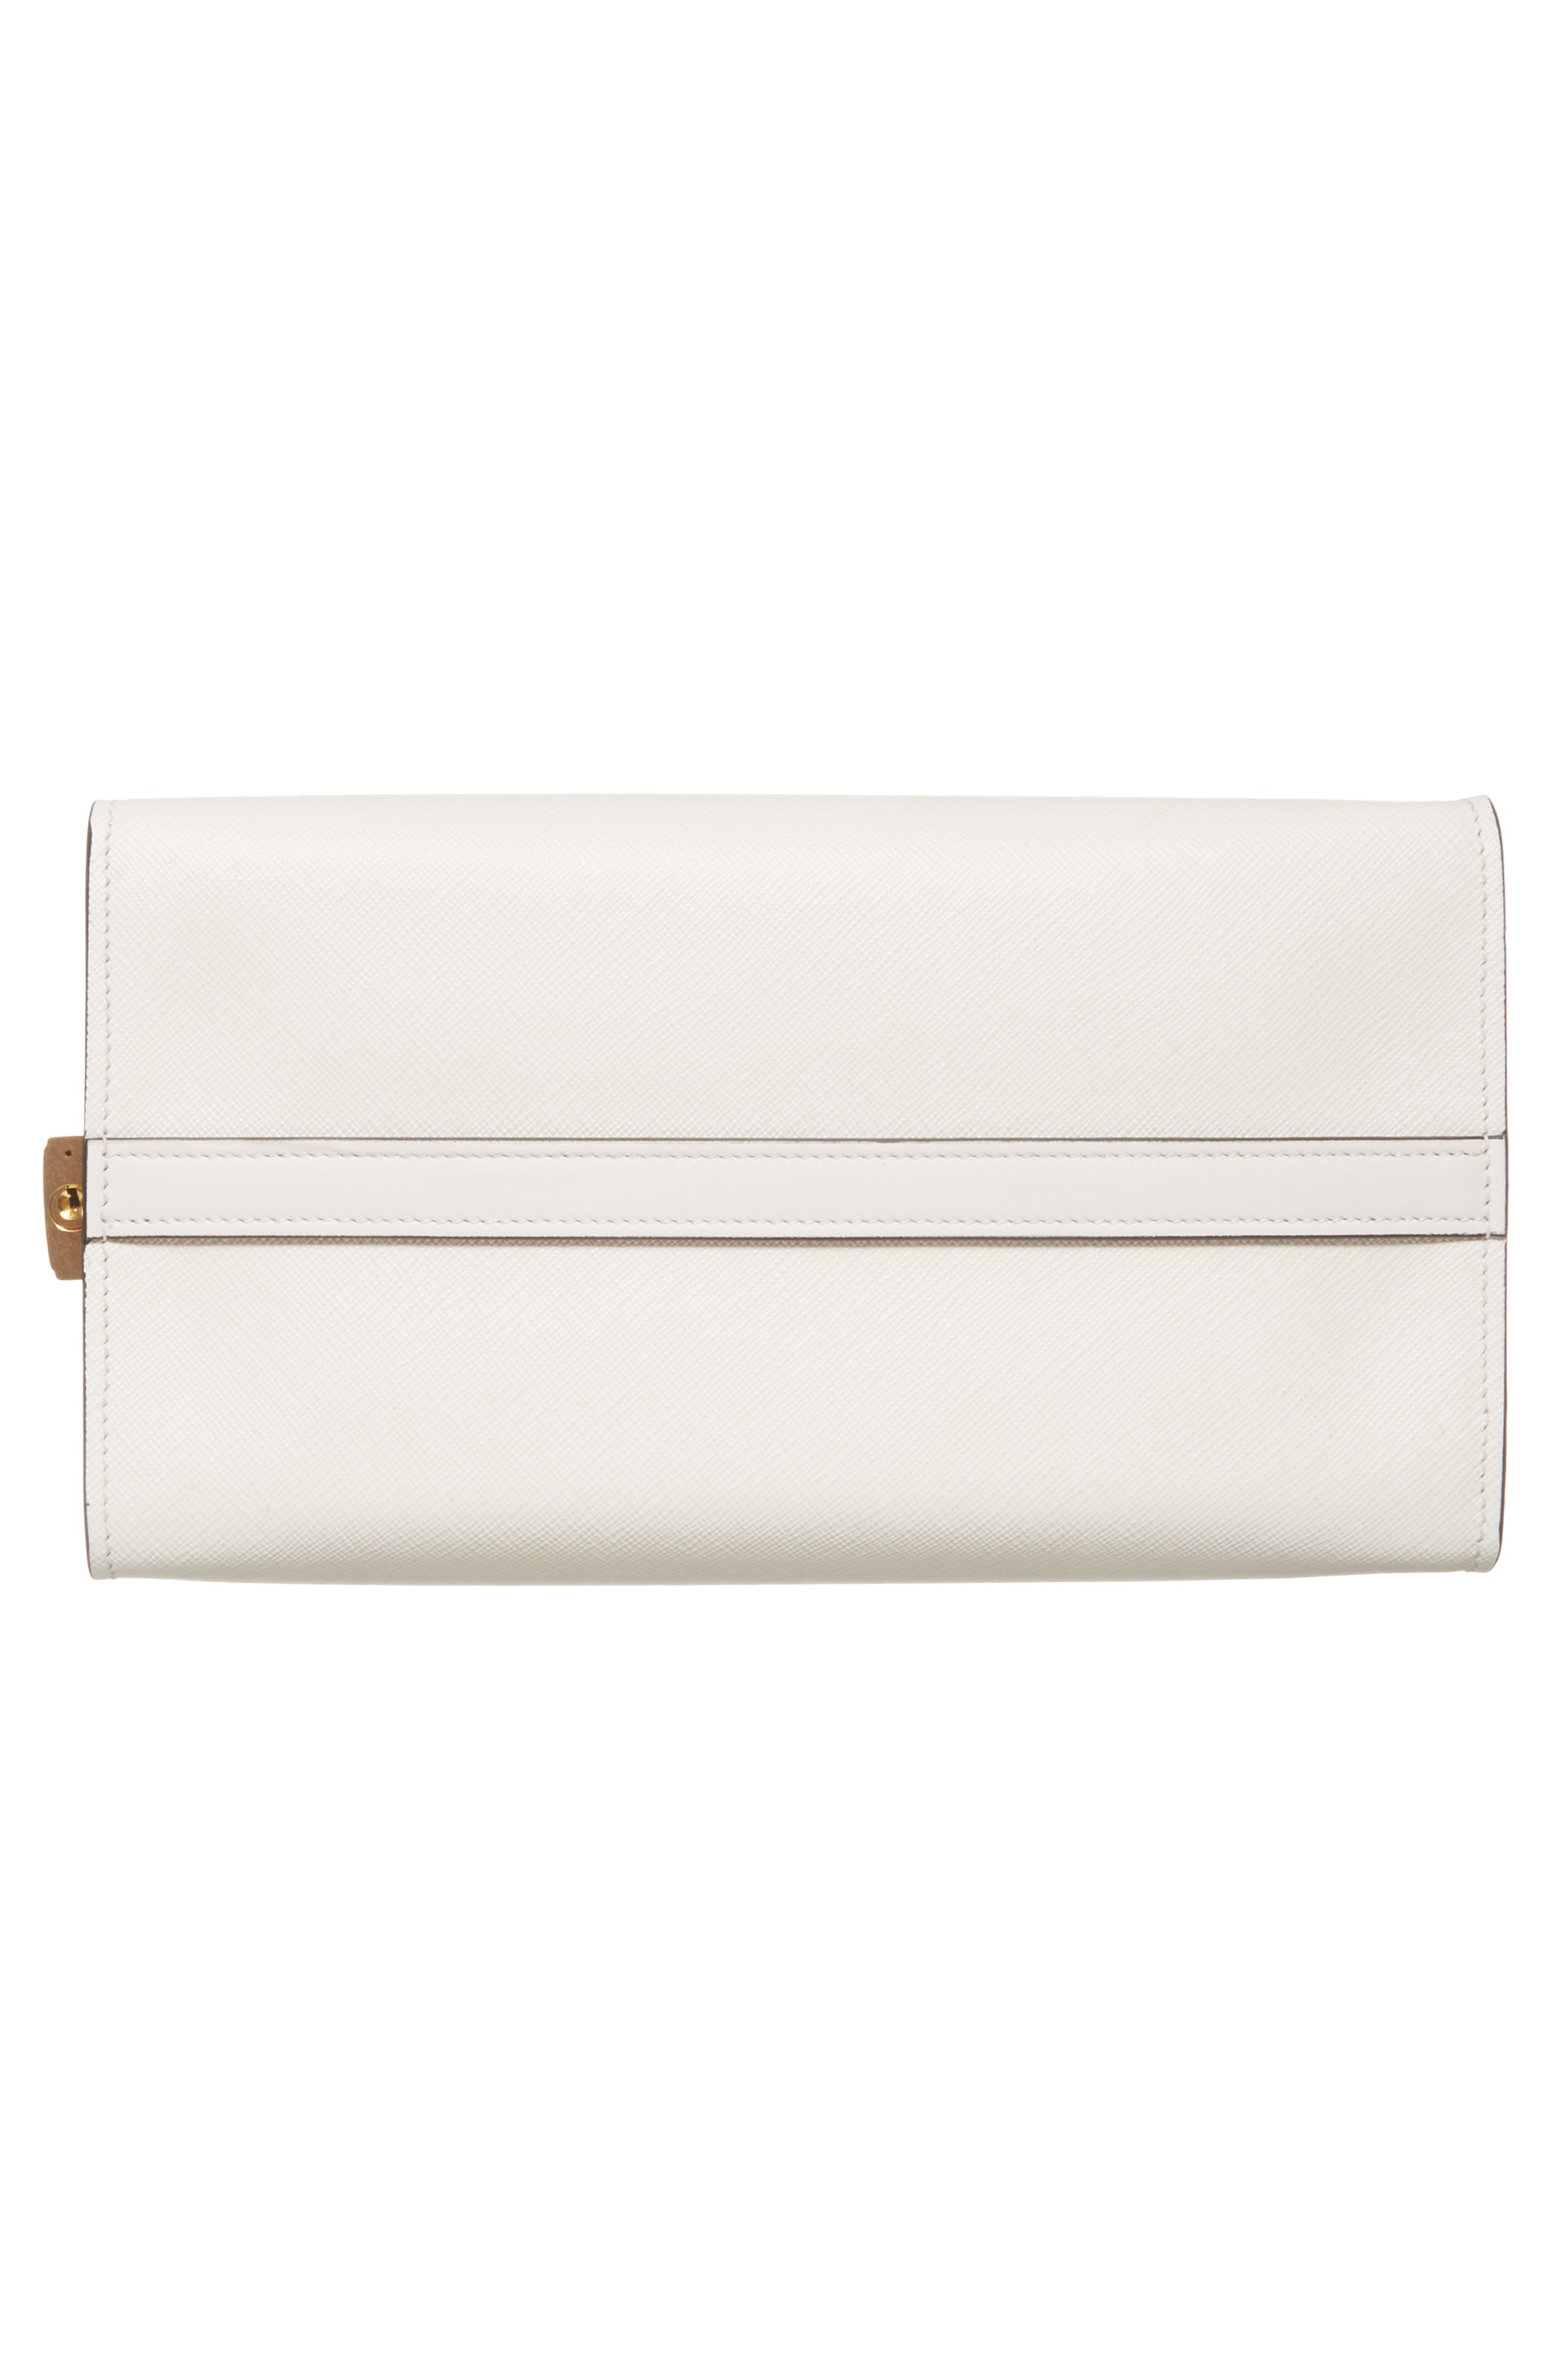 Medium Esplanade Leather Satchel,                             Alternate thumbnail 6, color,                             Bianco/Nero